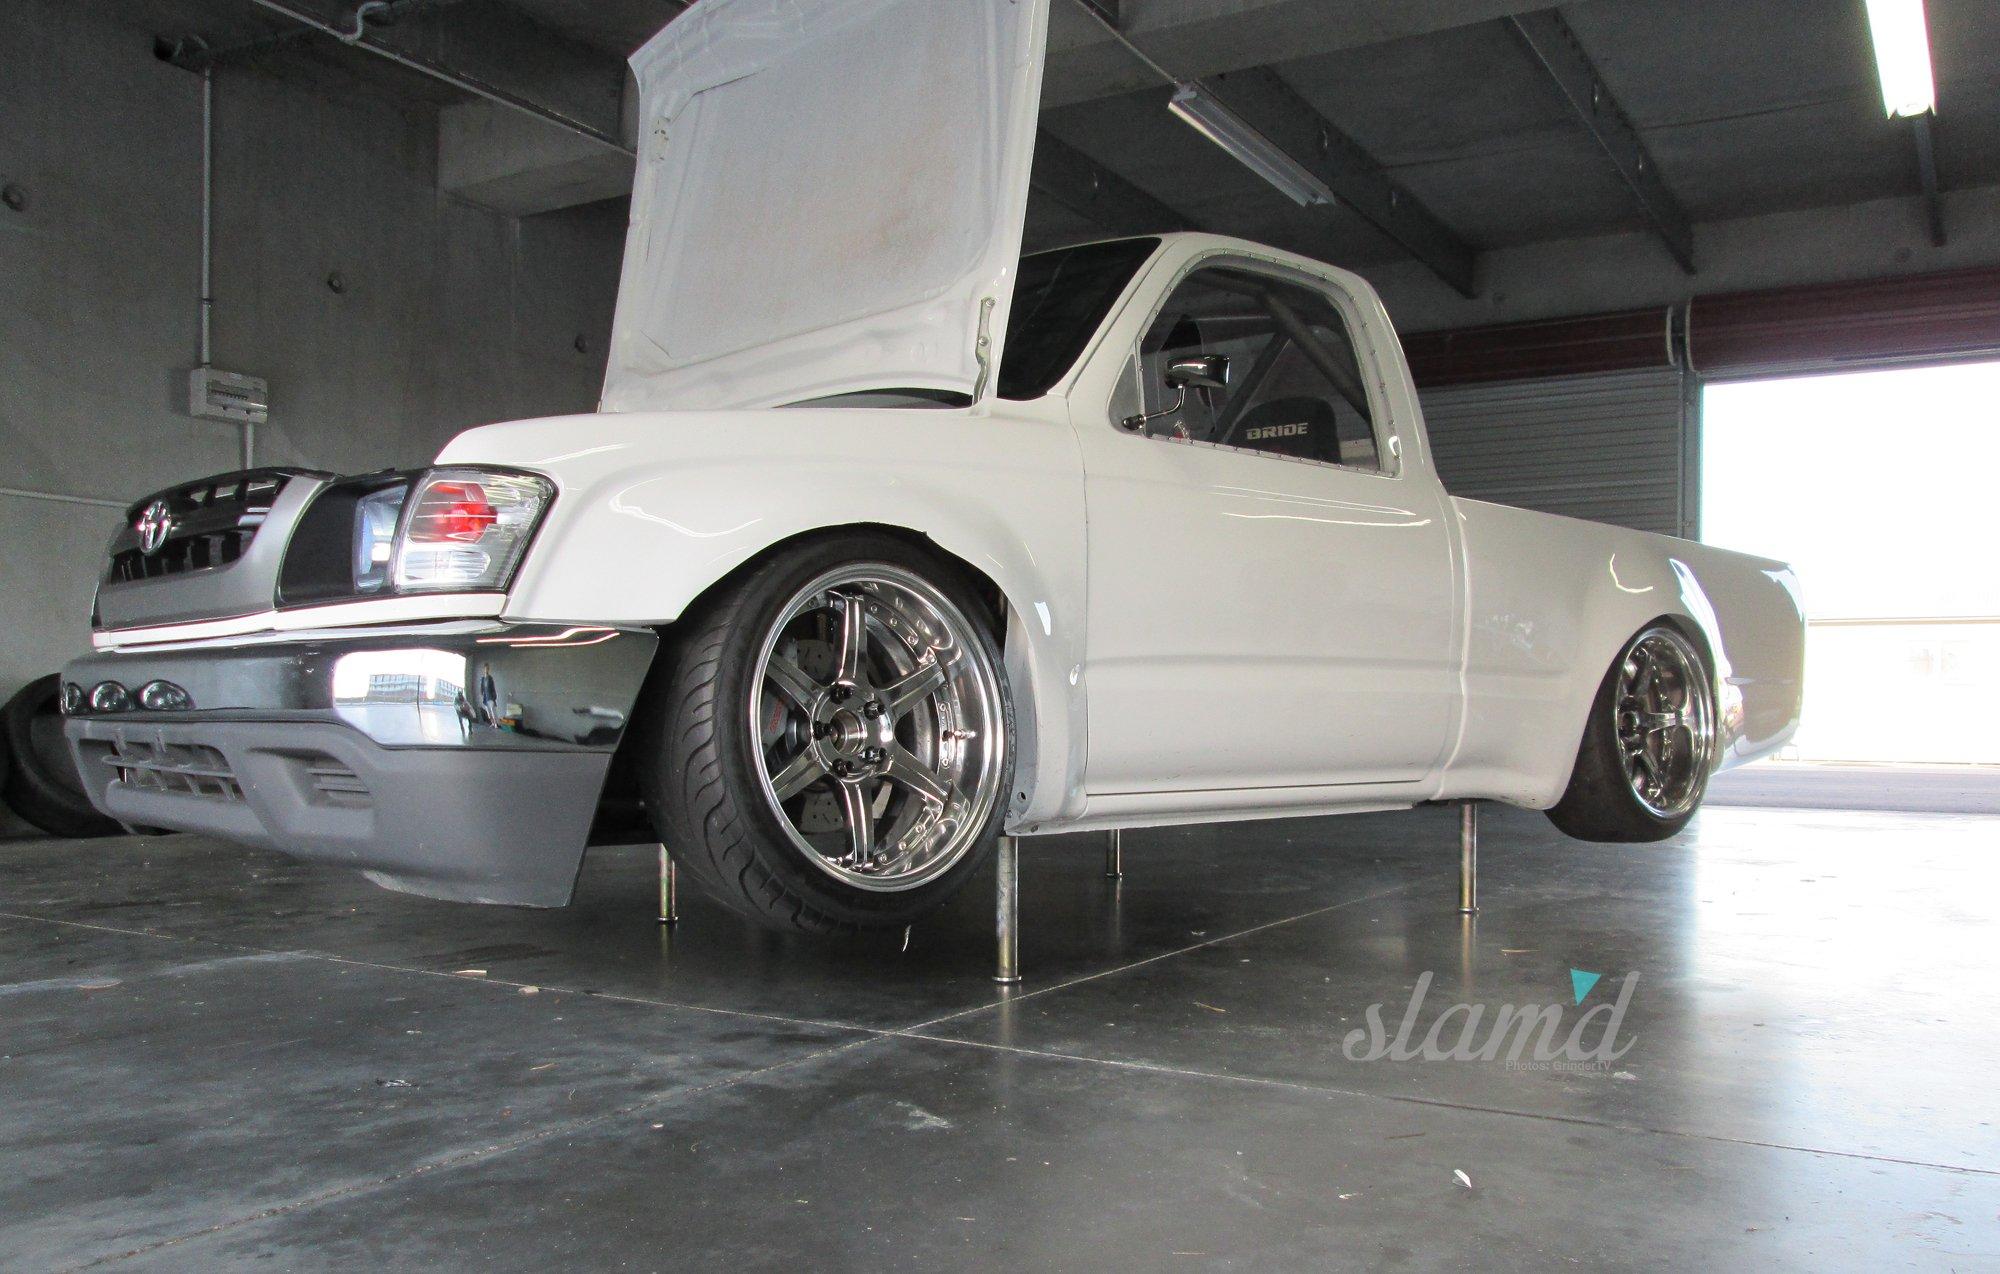 Lowrider Car Wallpaper 2001 Toyota Hilux Tacoma Pickup Lowrider Drift Custom